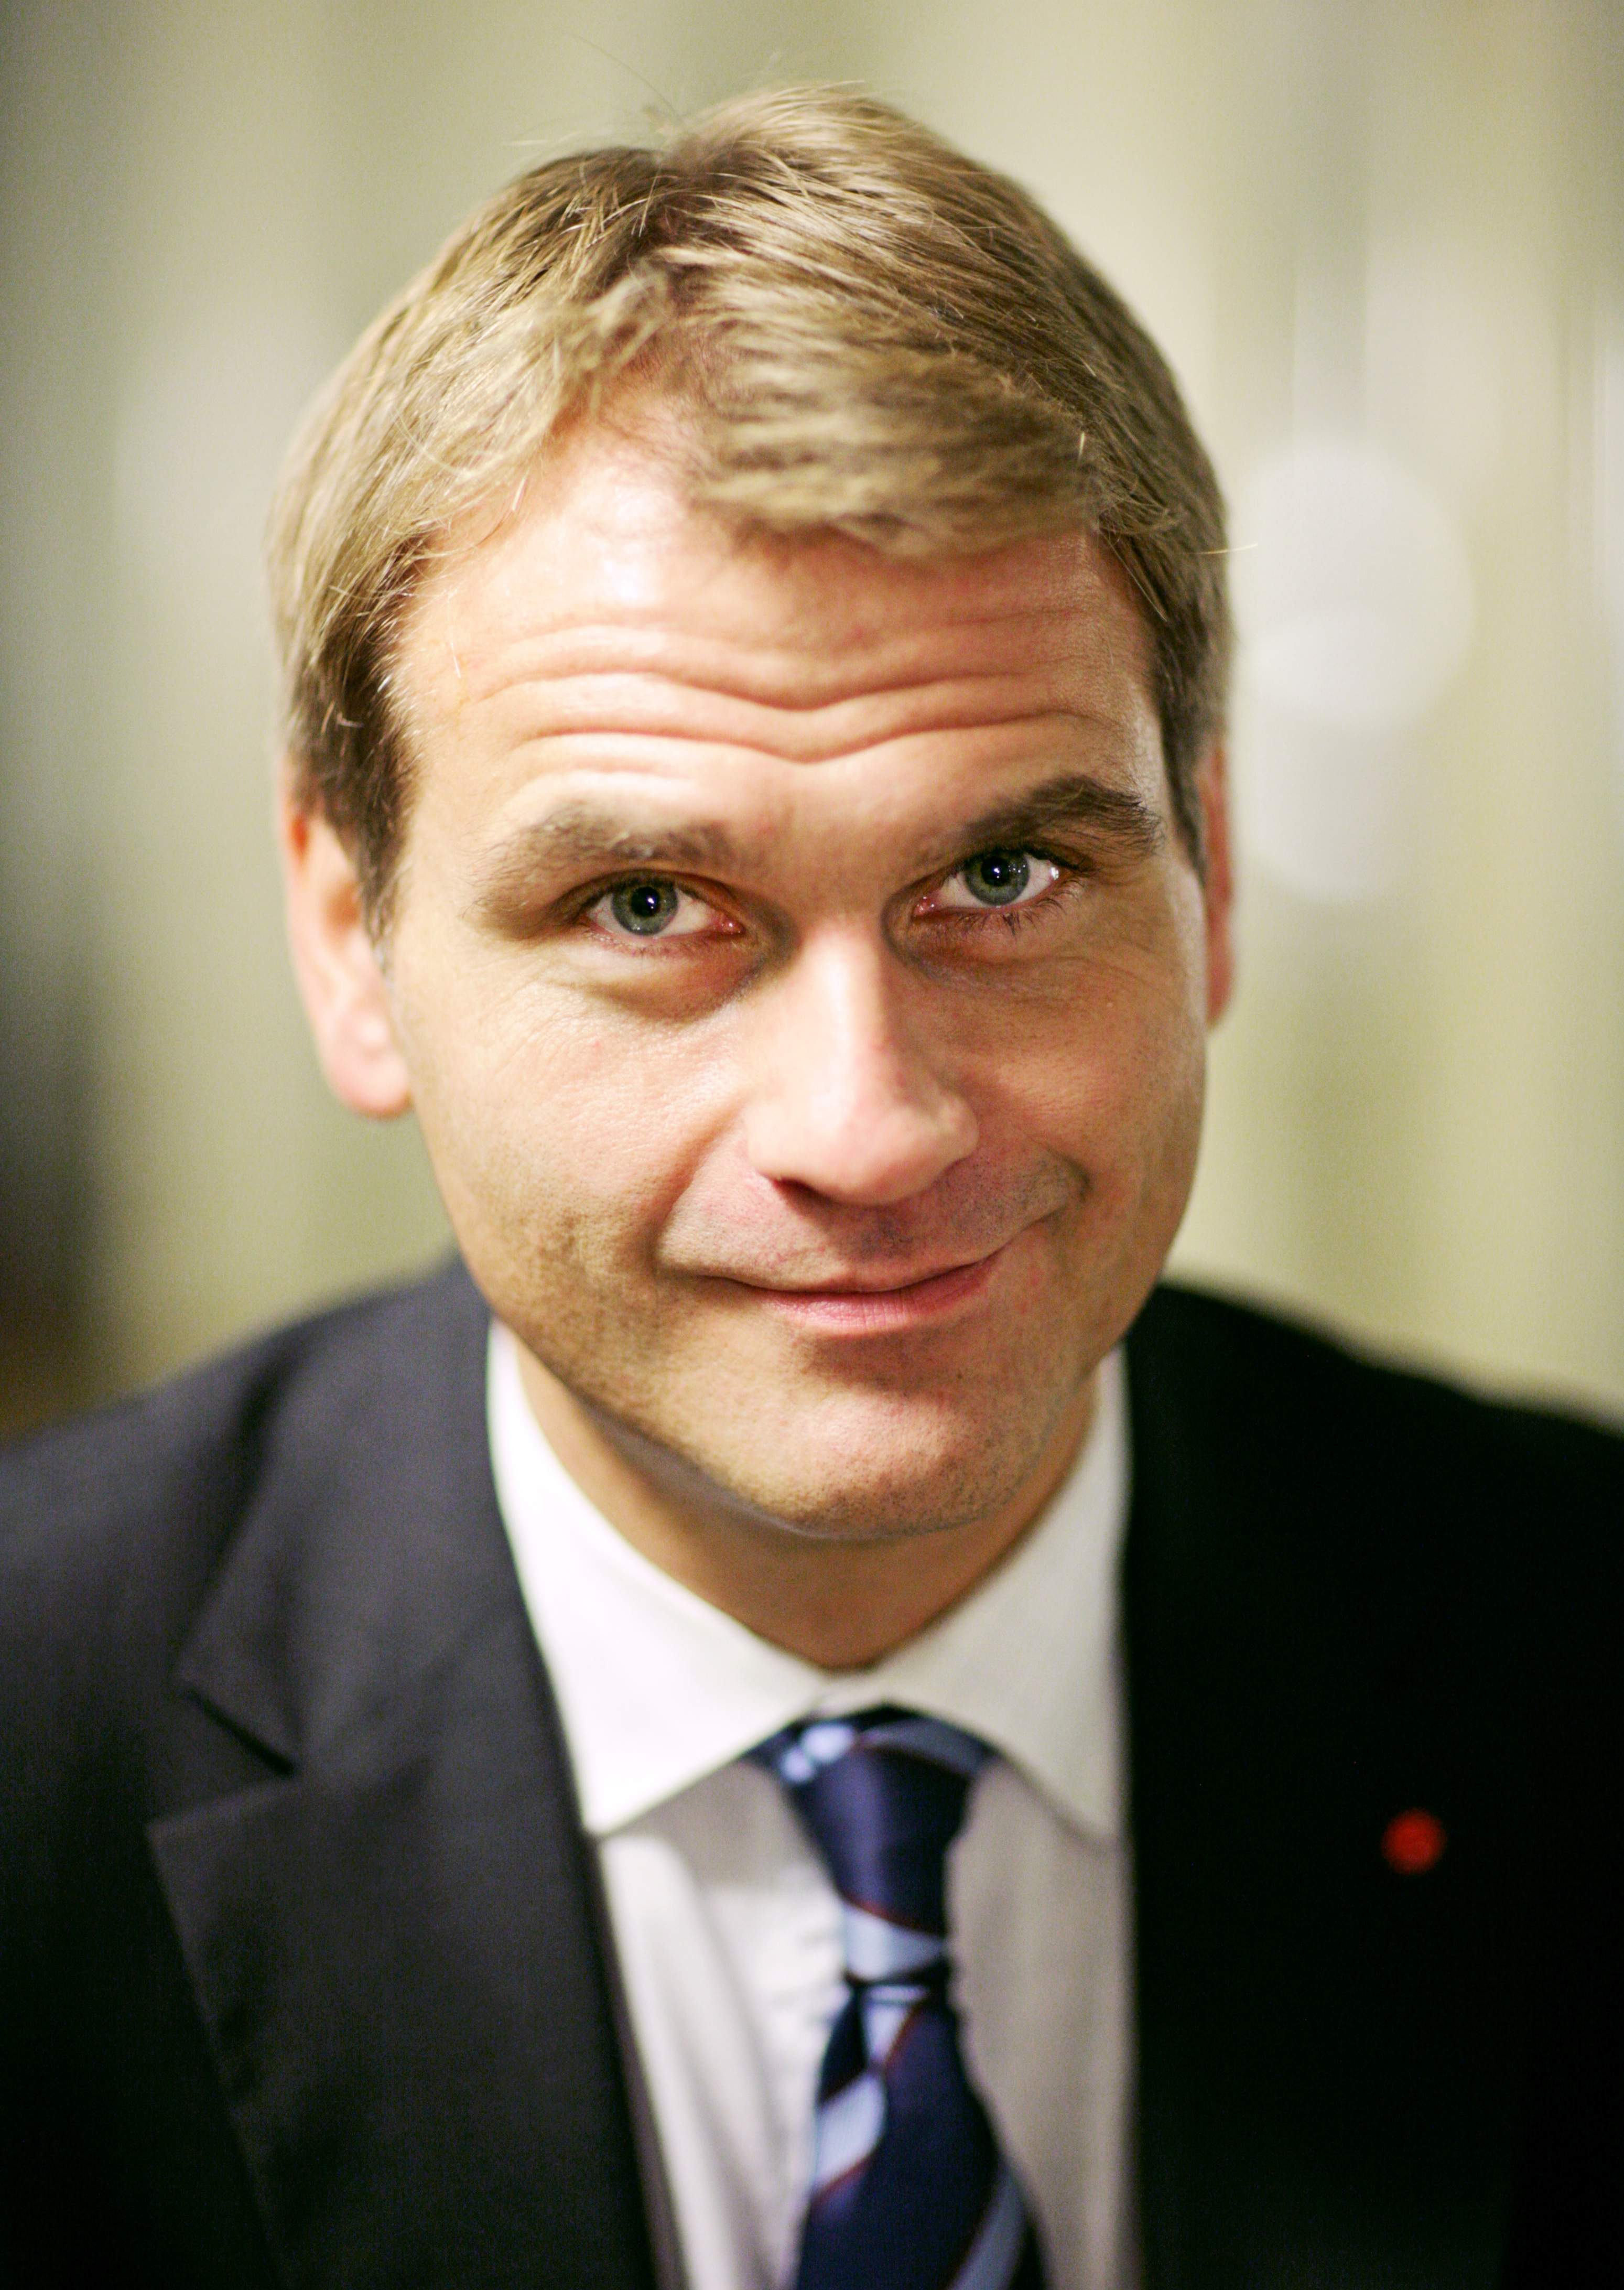 Árni Páll Árnason - Wikipedia